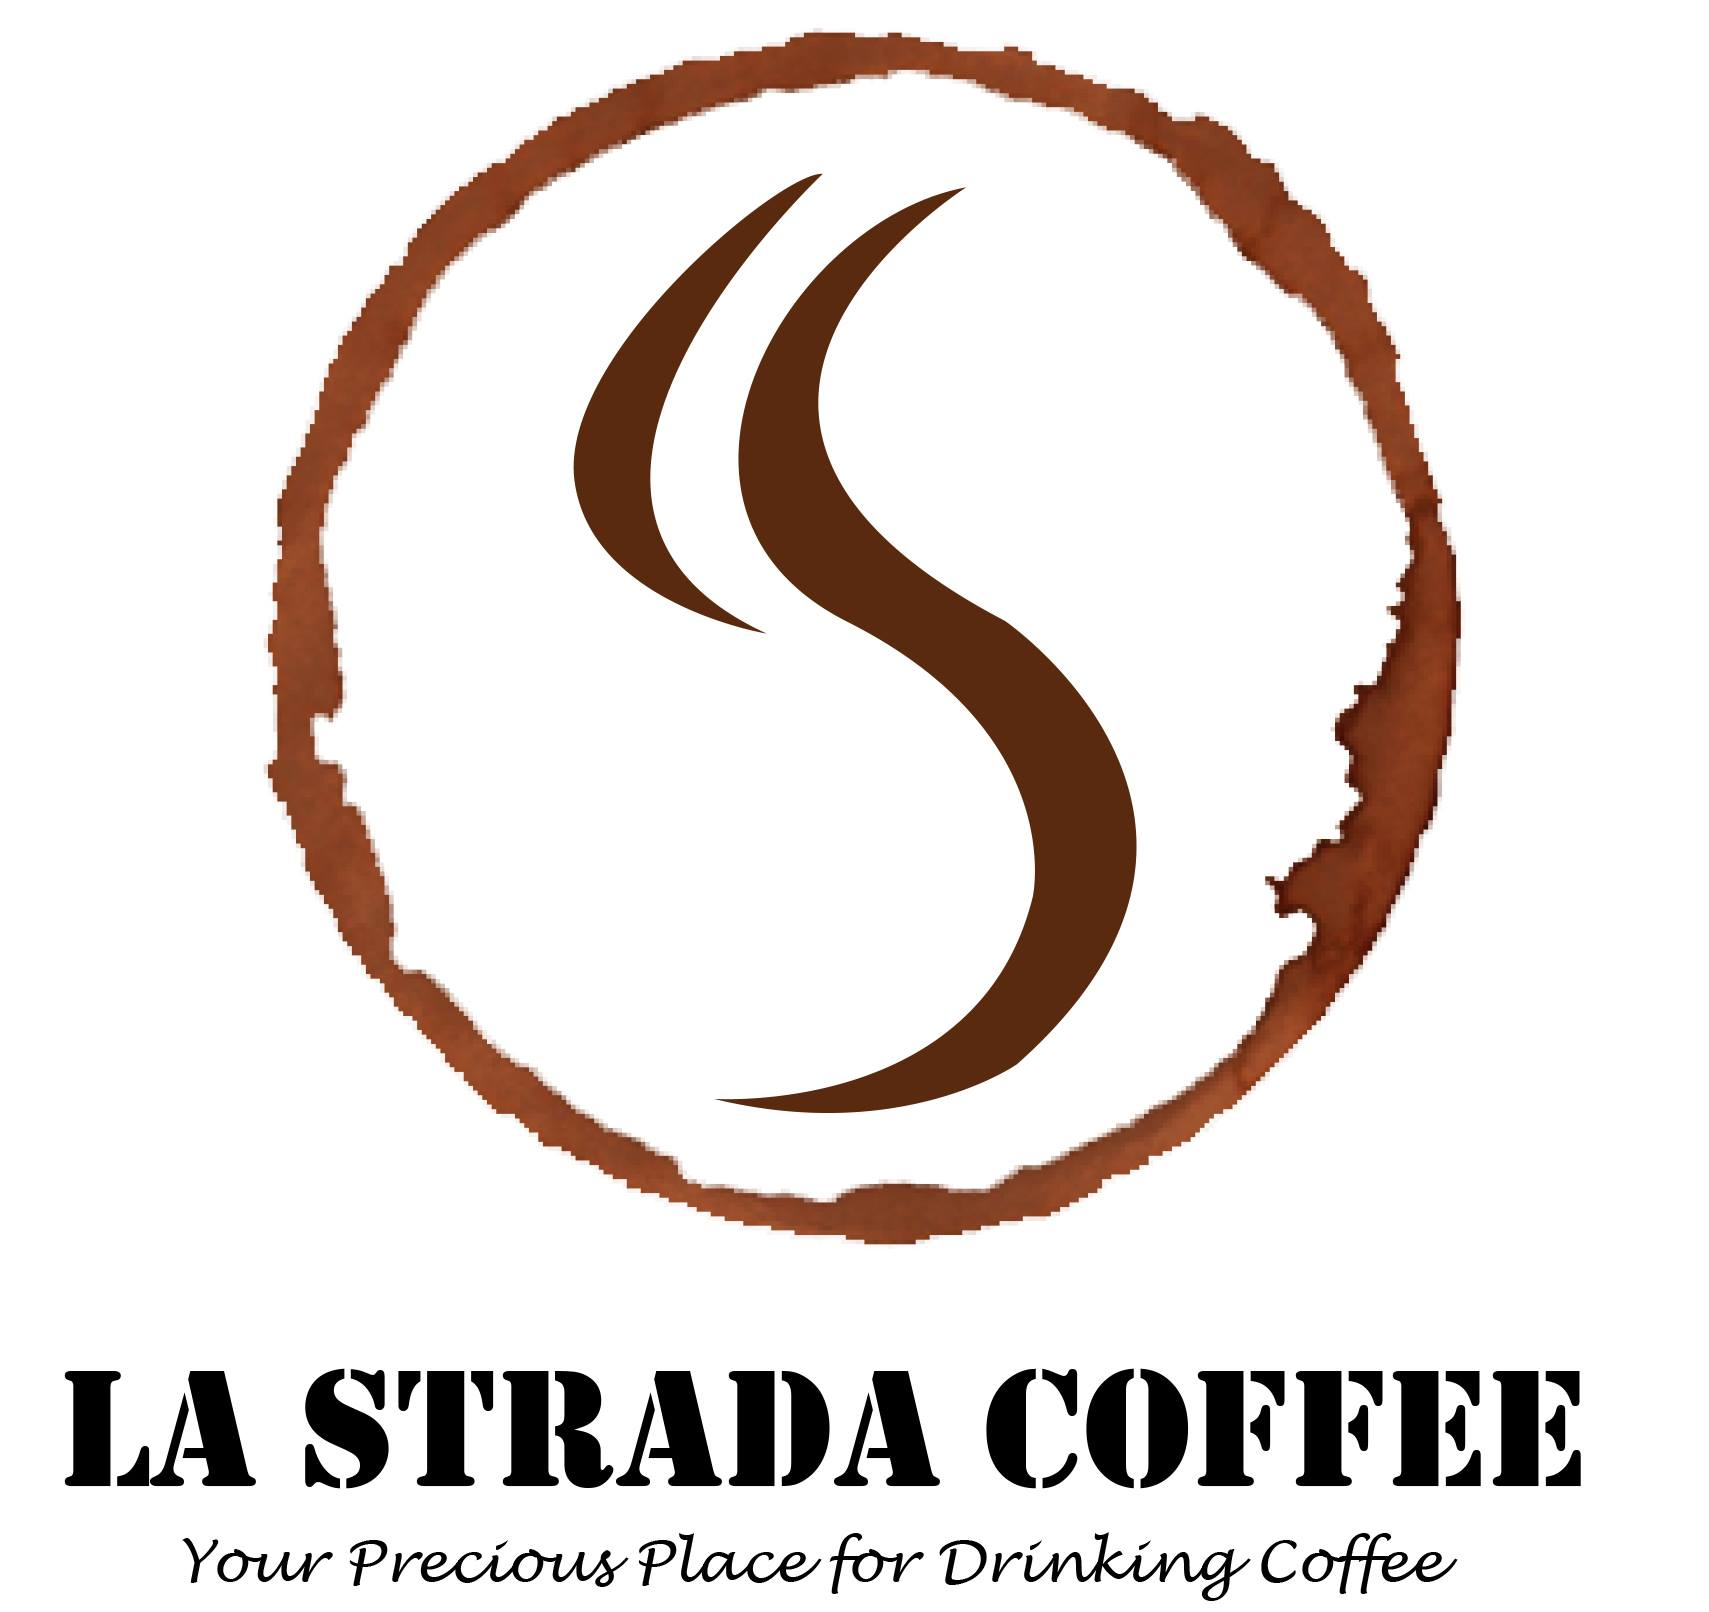 LA STRADA COFFEE